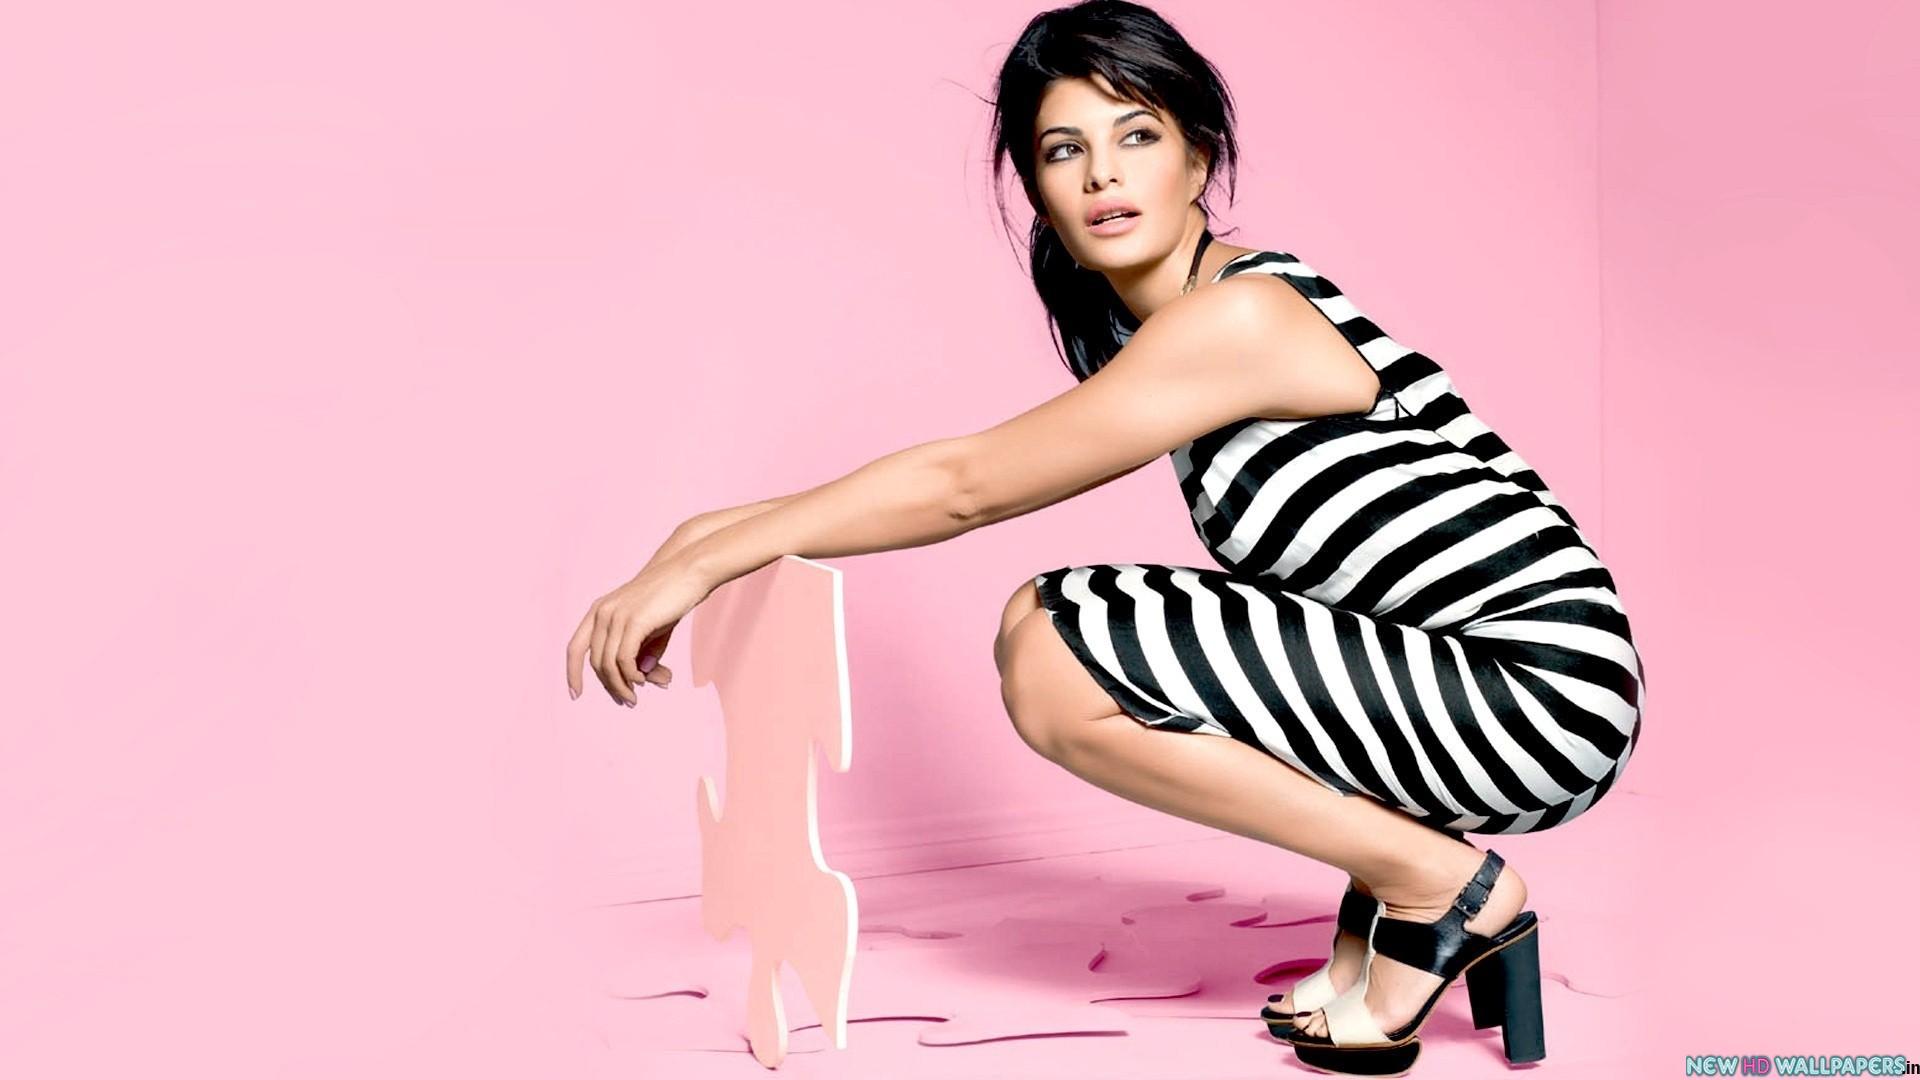 Jacqueline Fernandez hot wallpaper